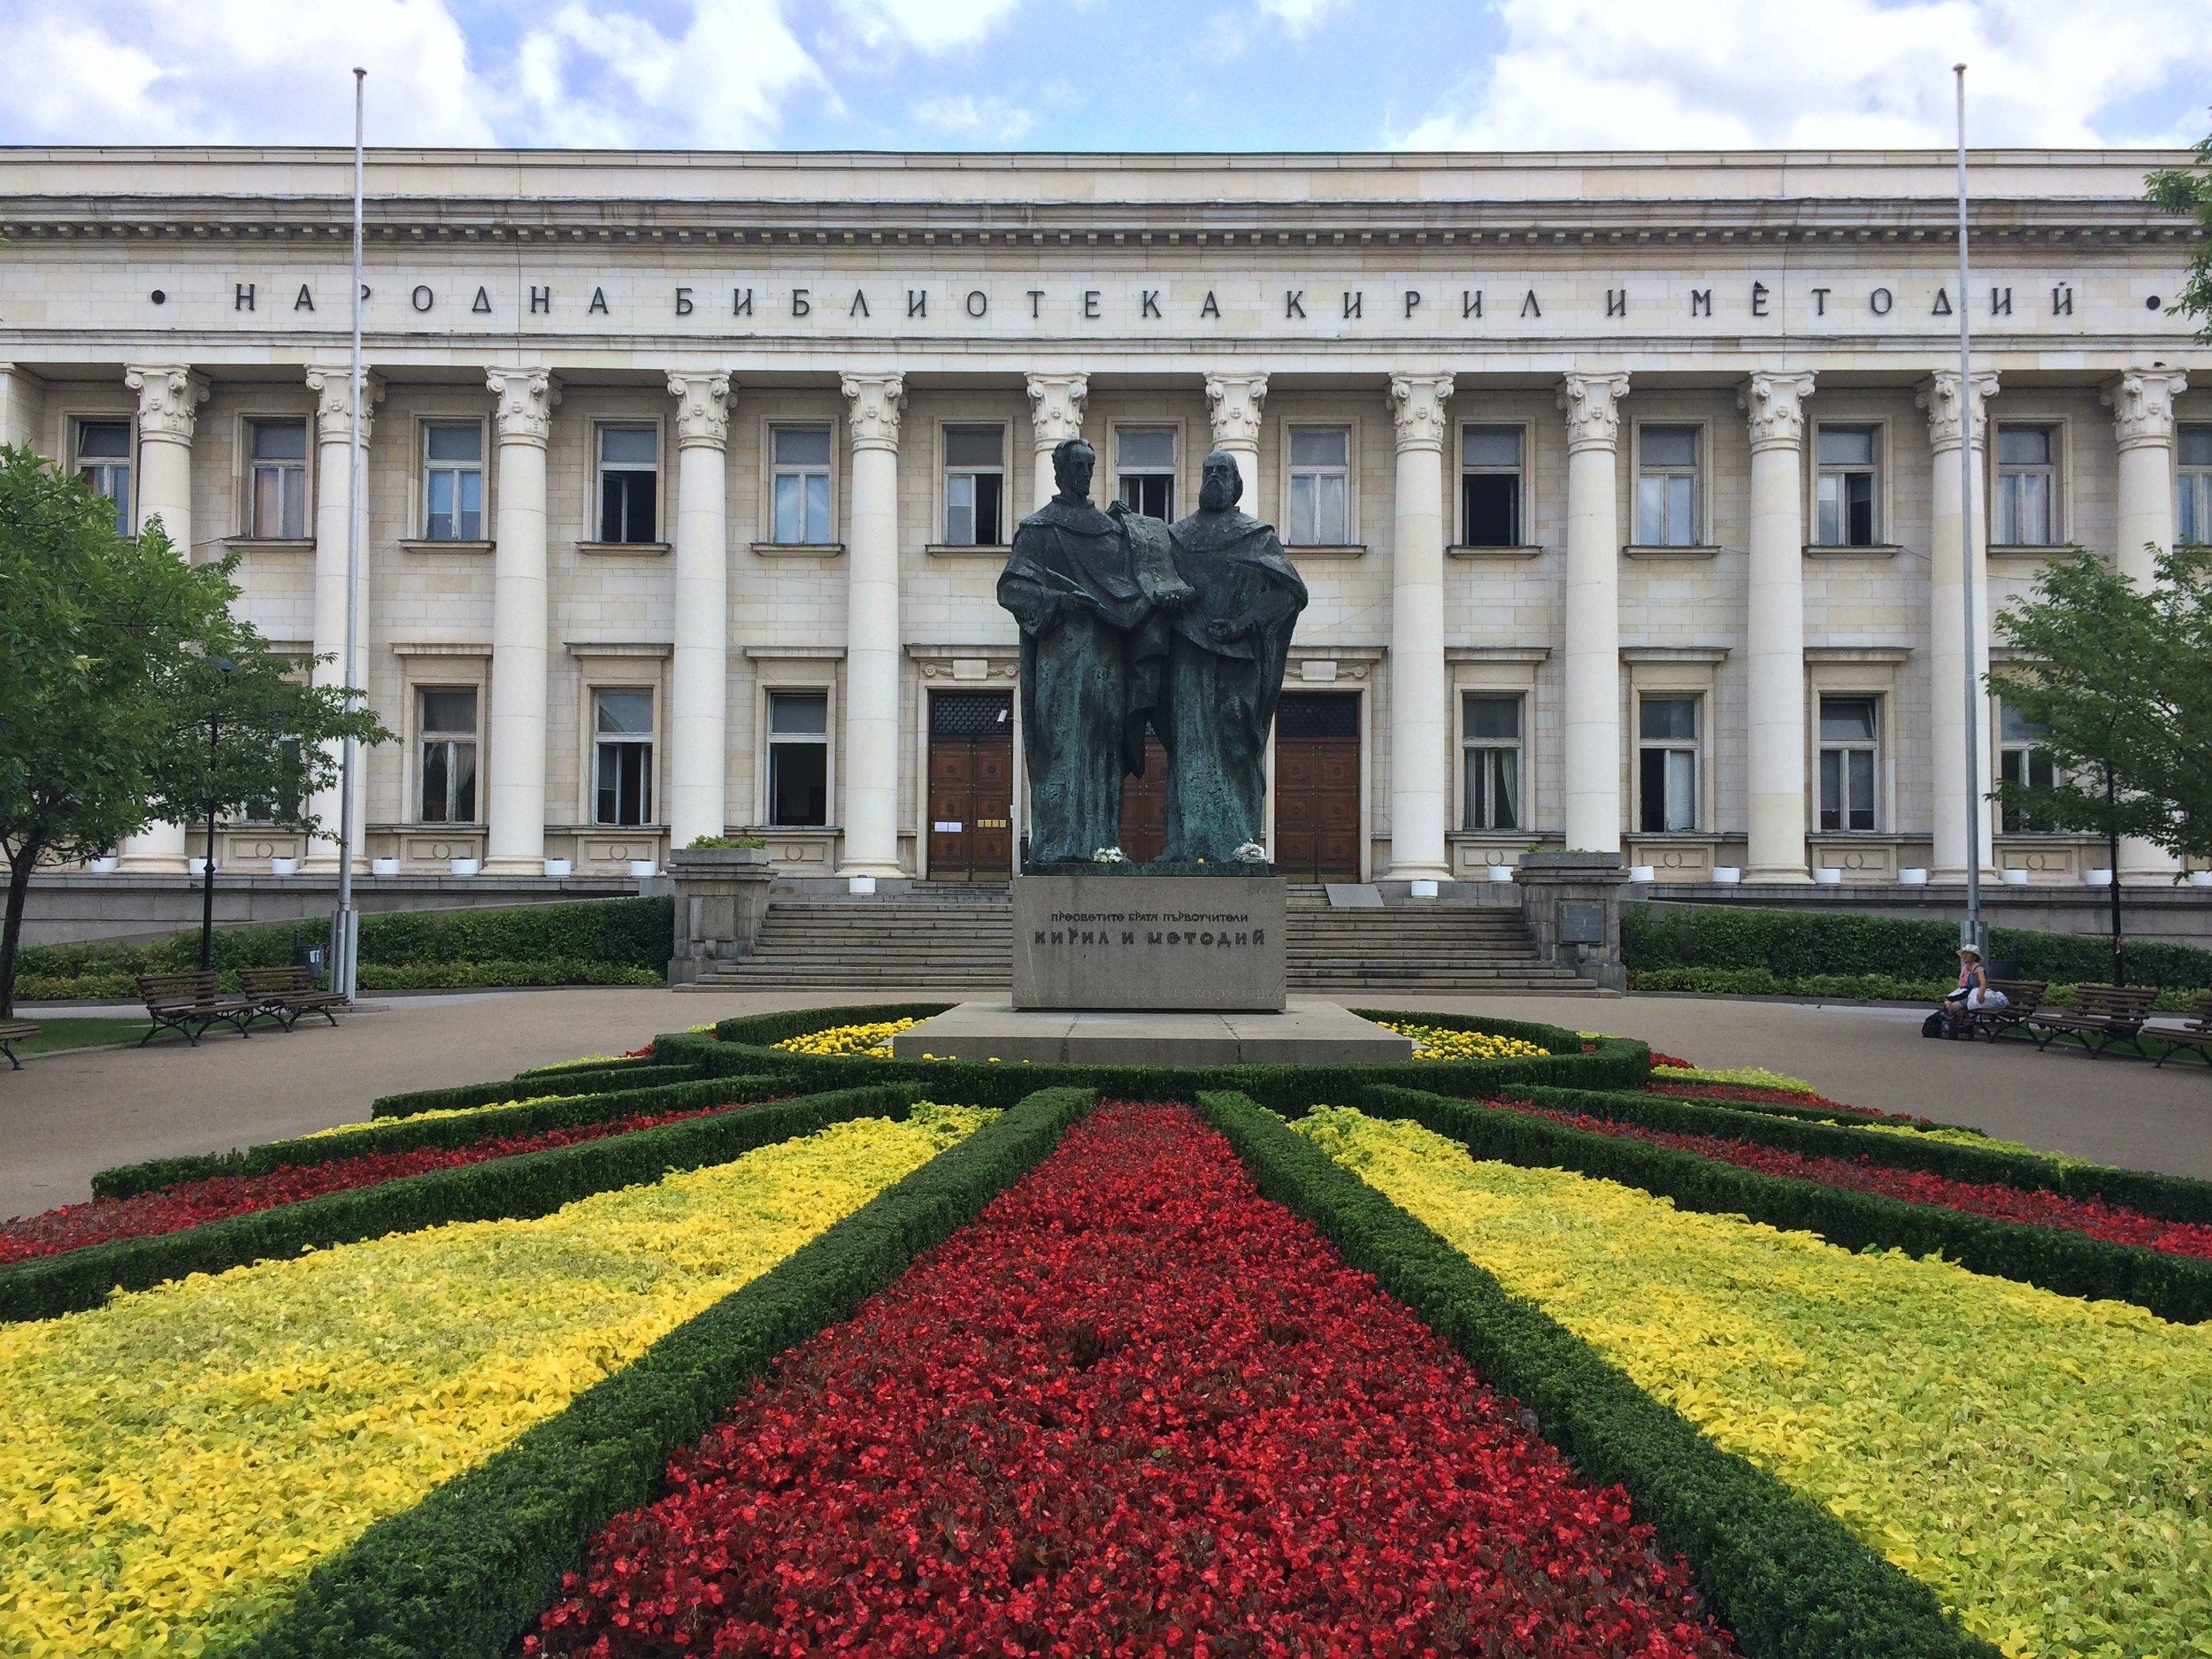 Bulgarian National Library, Sofia, Bulgaria